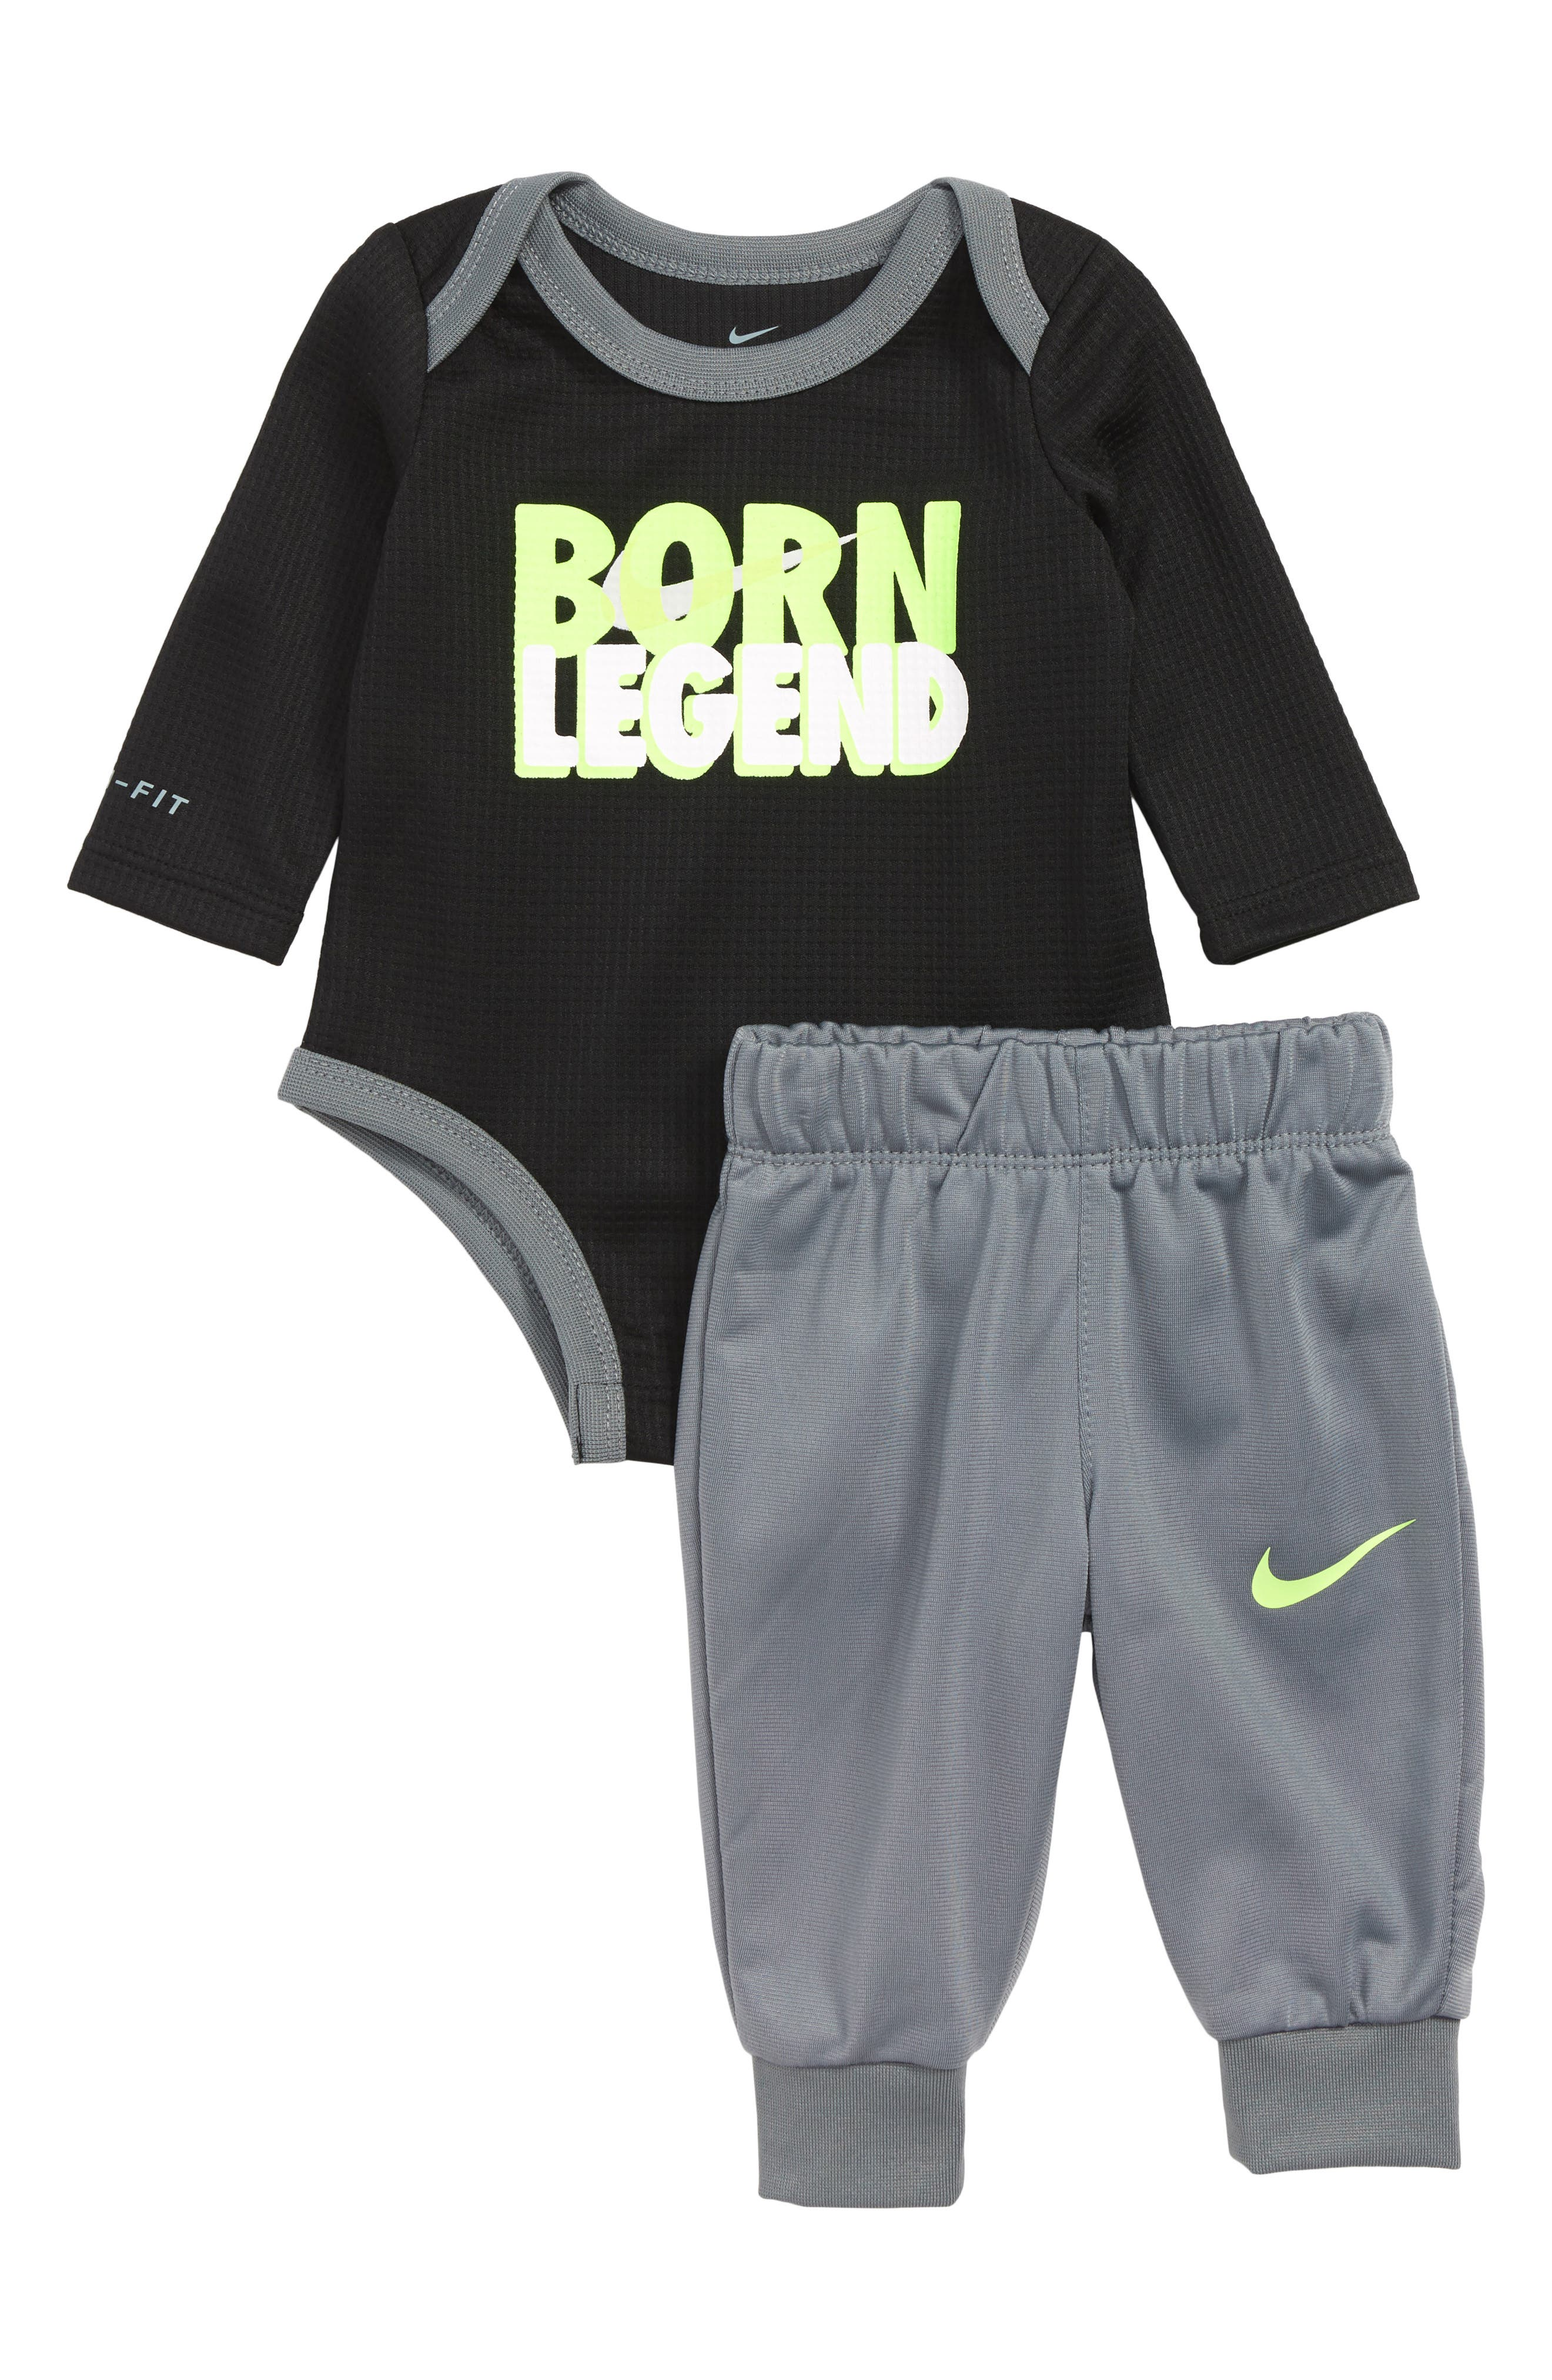 Infant Boys Nike Born Legend Thermal Bodysuit  Sweatpants Set